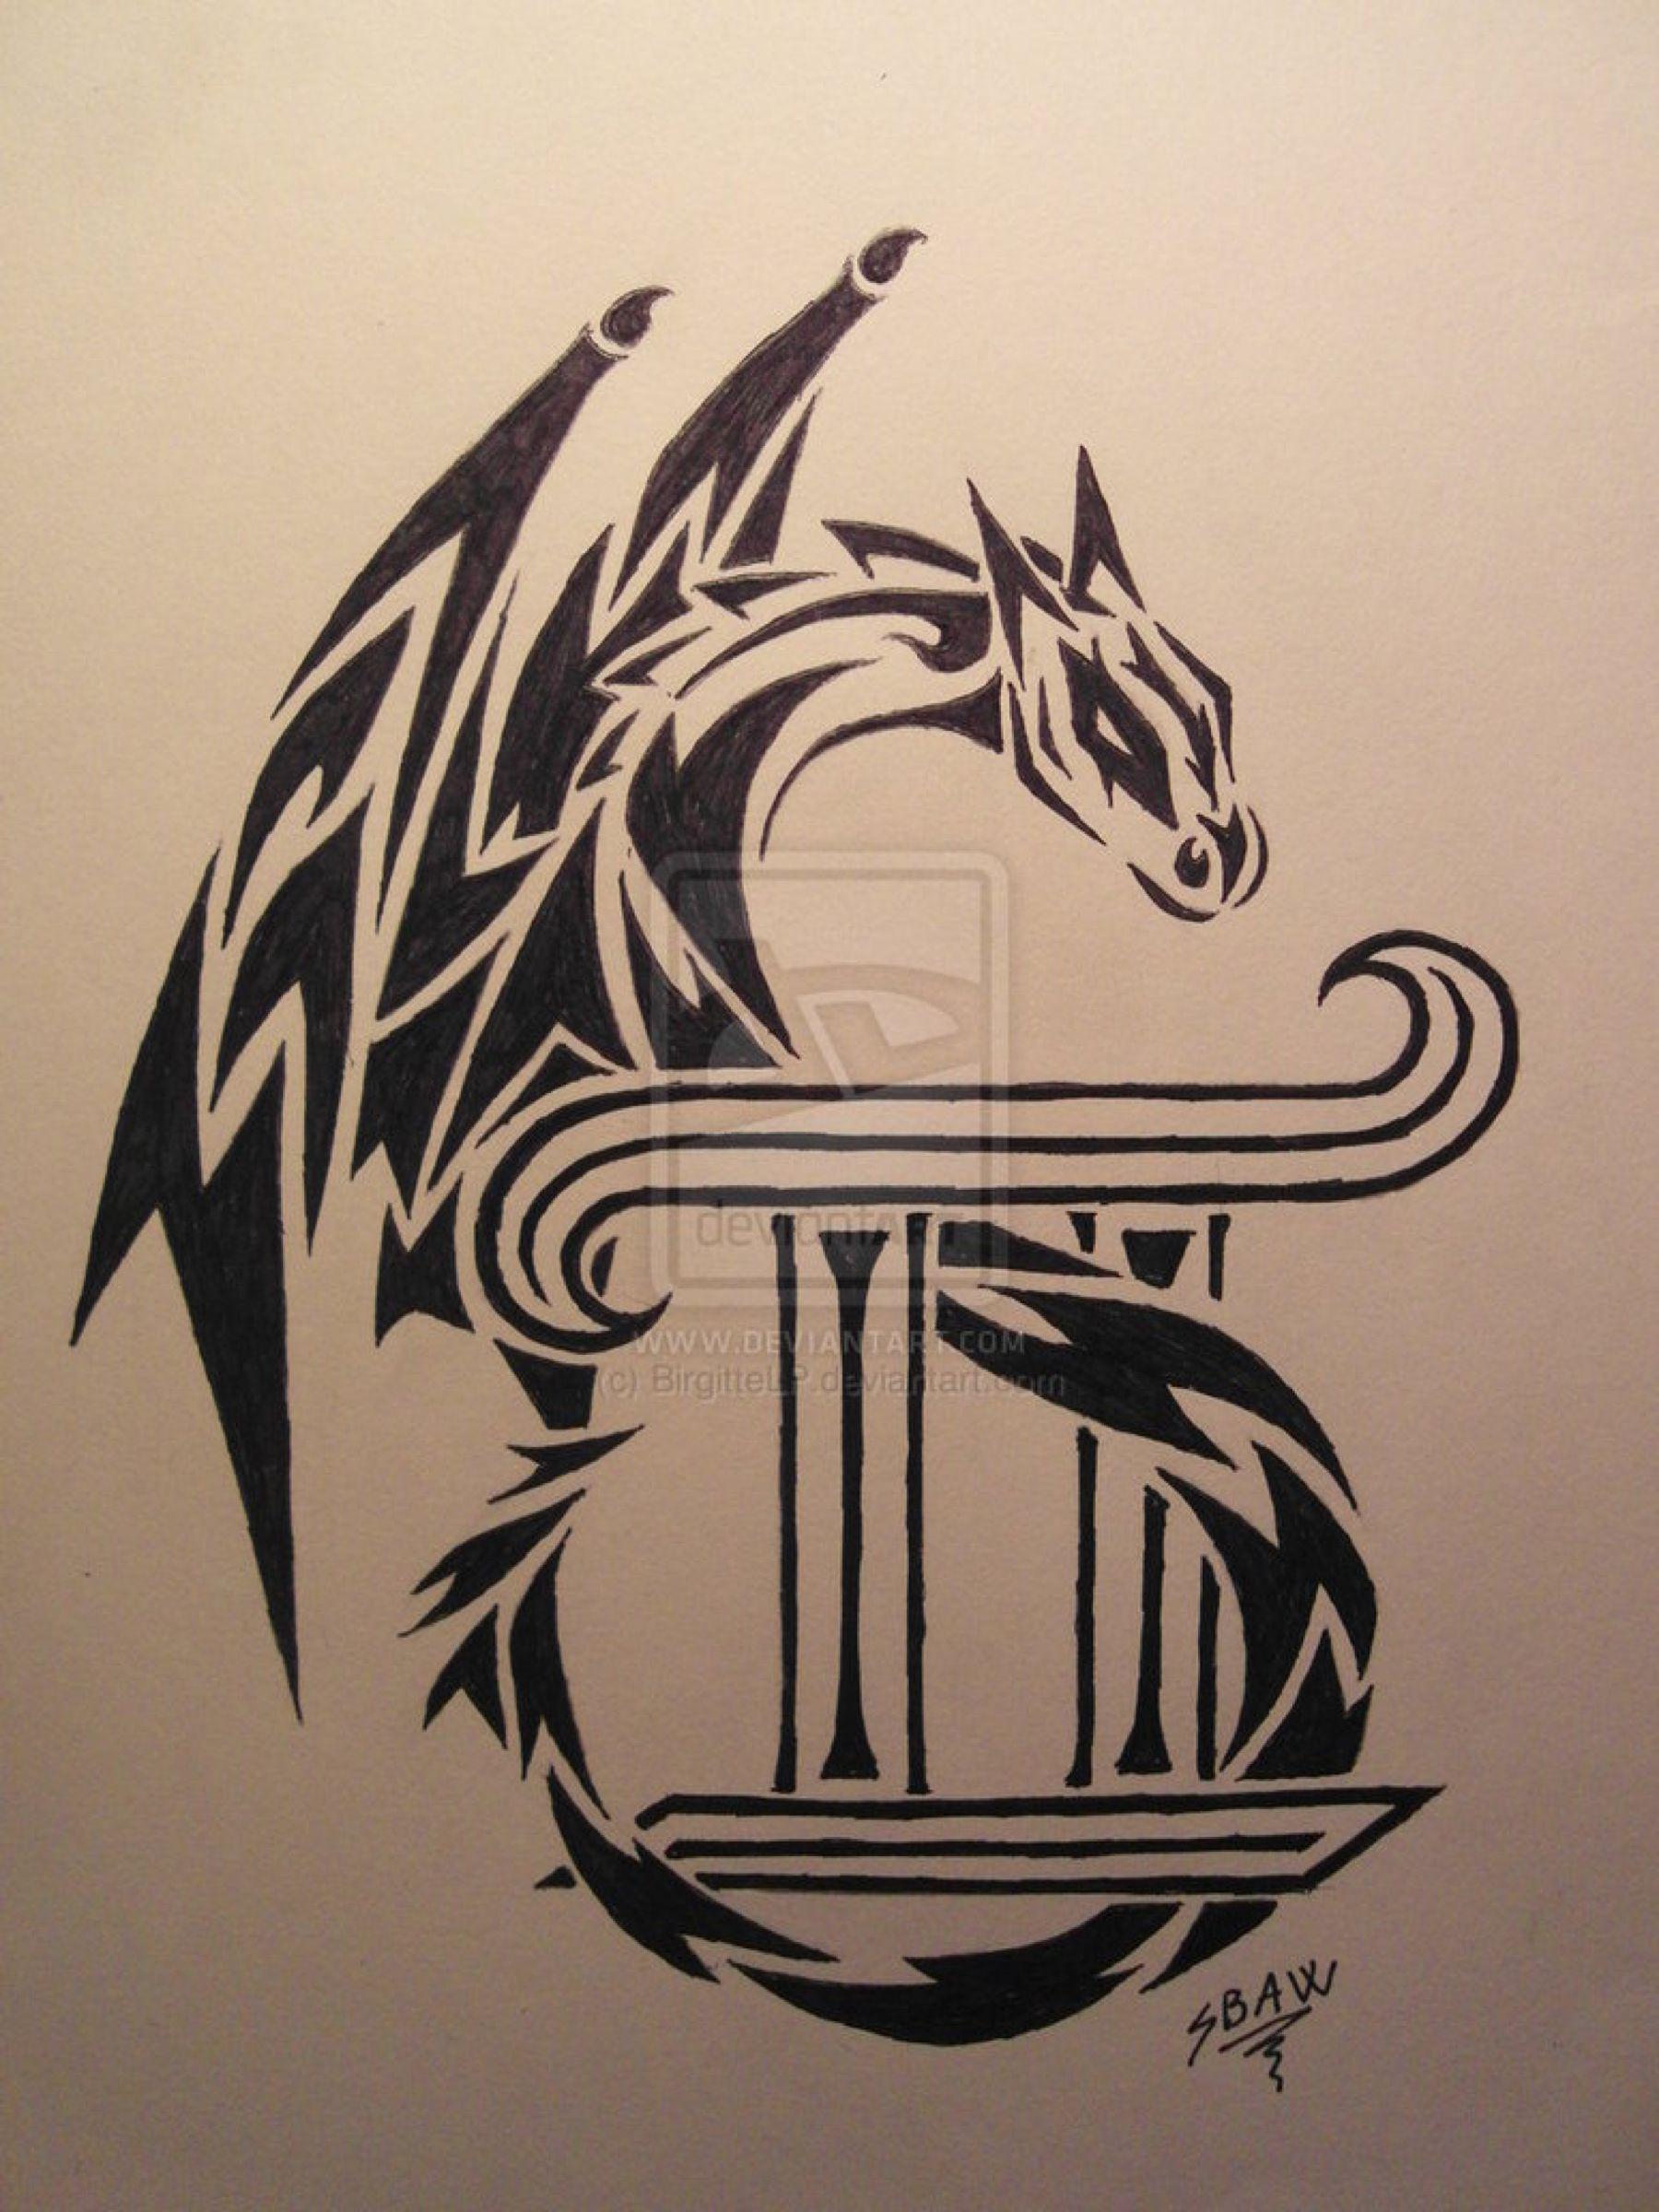 fe4172d728ecd Dragon Gemini Tattoo by Lostamongstars on @DeviantArt | Cool Tattoos ...